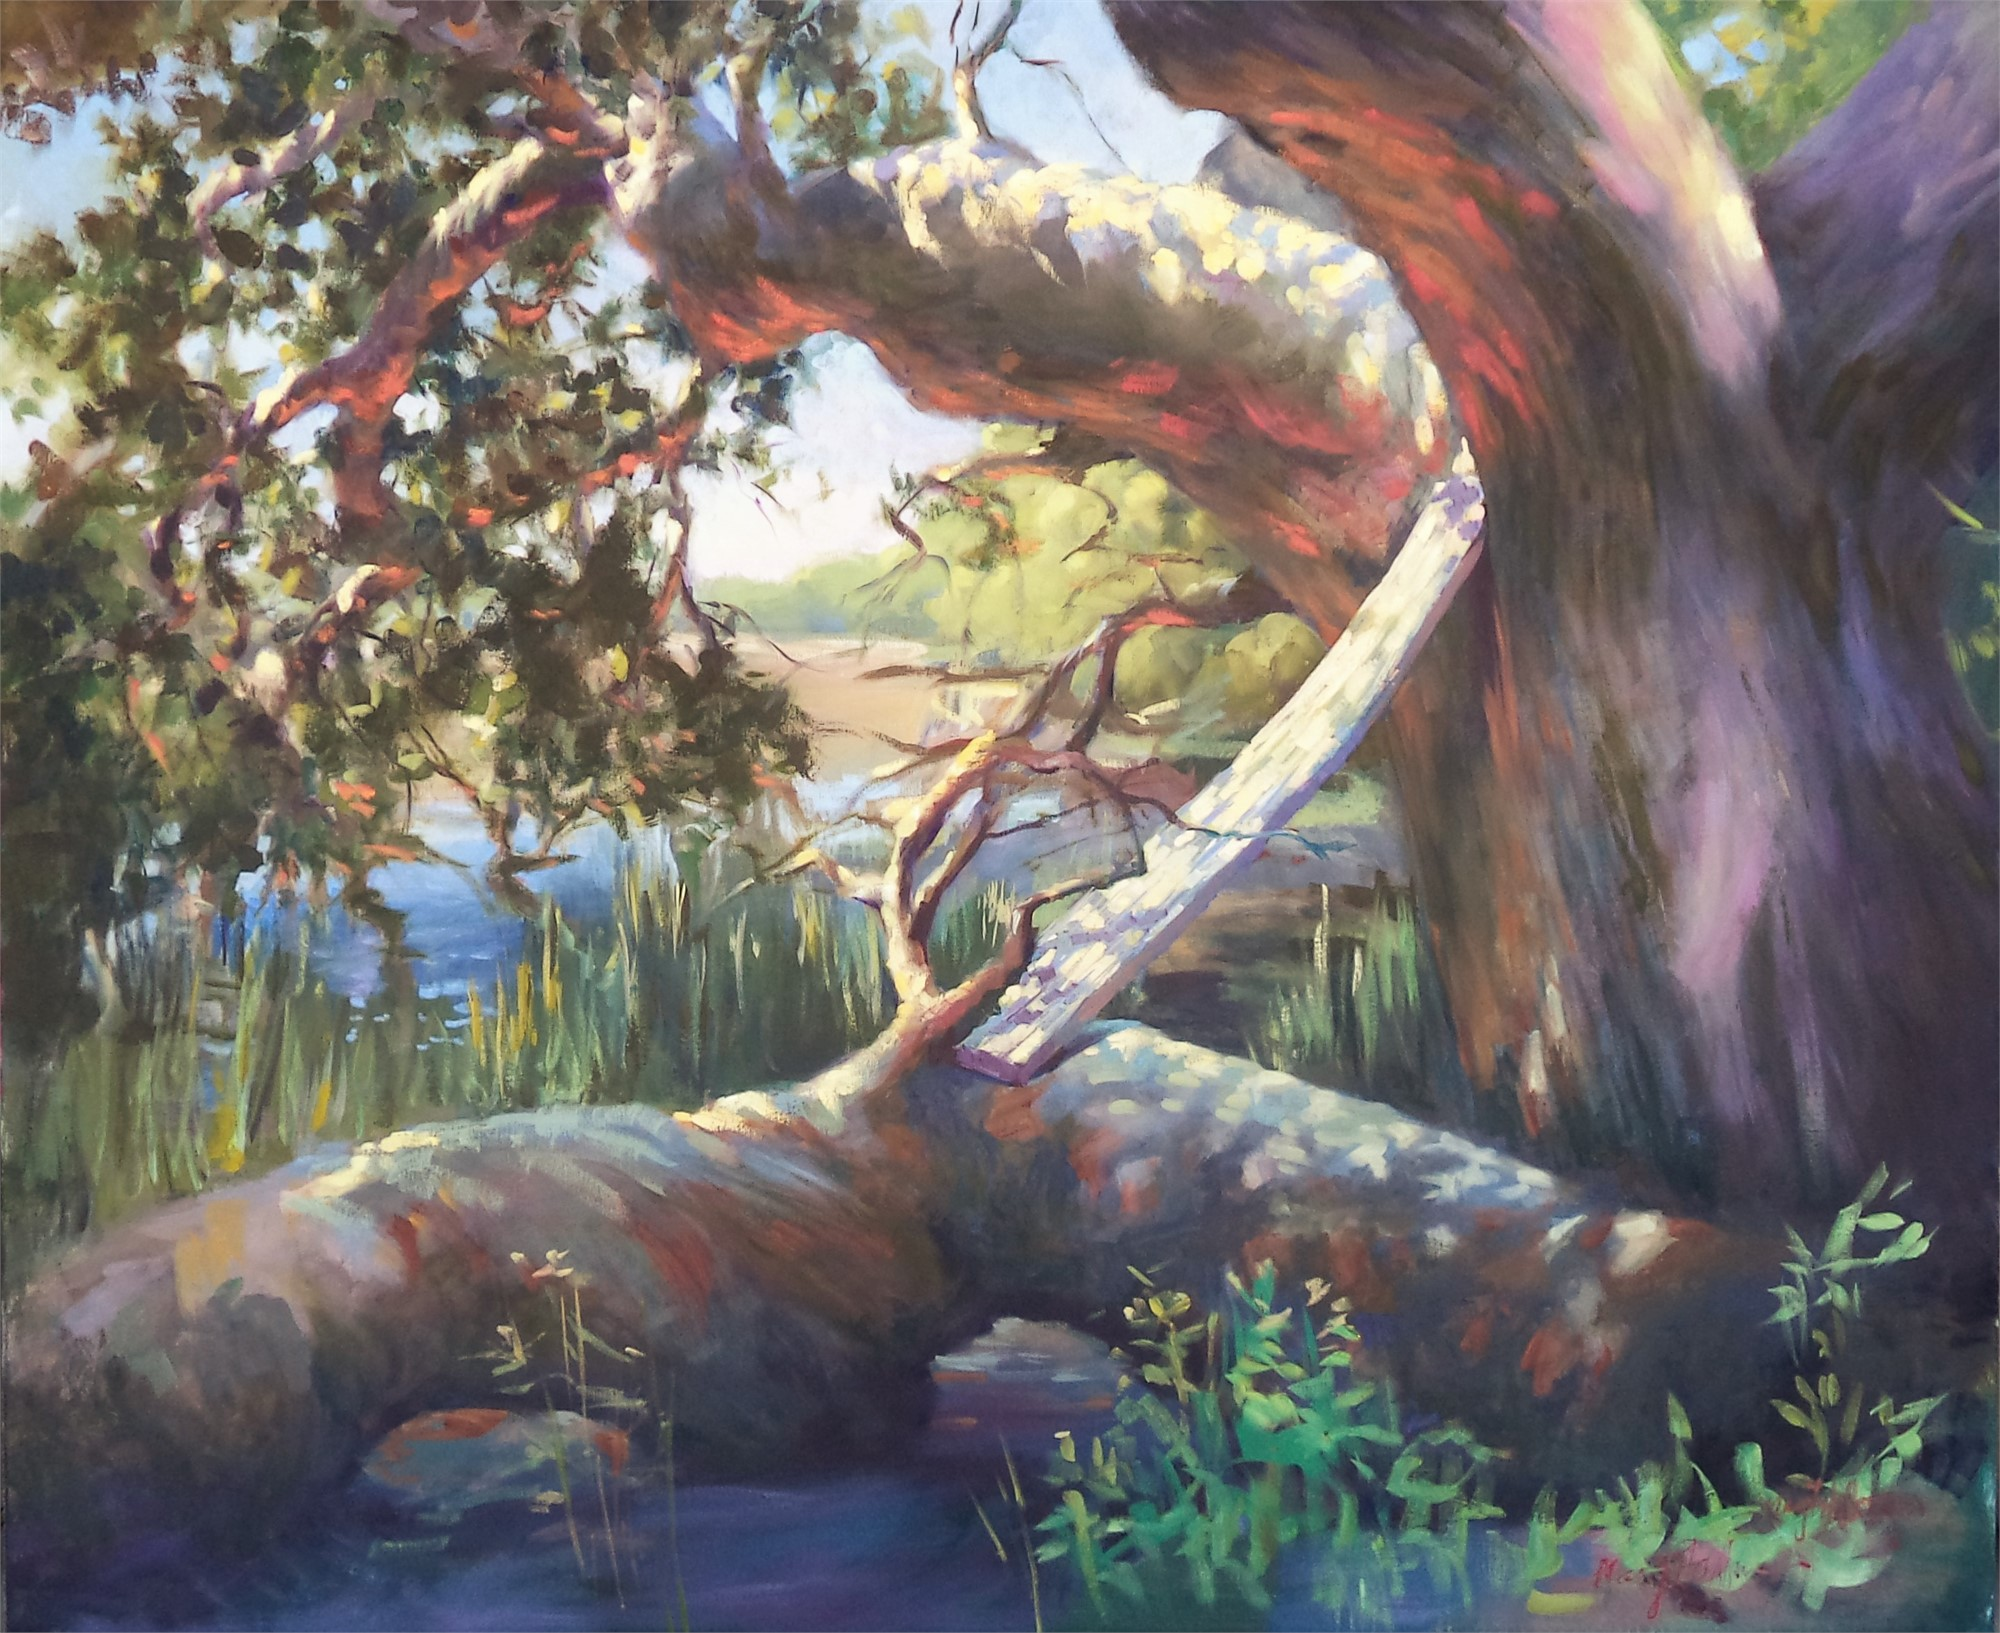 Family Tree by Mary Hoffman